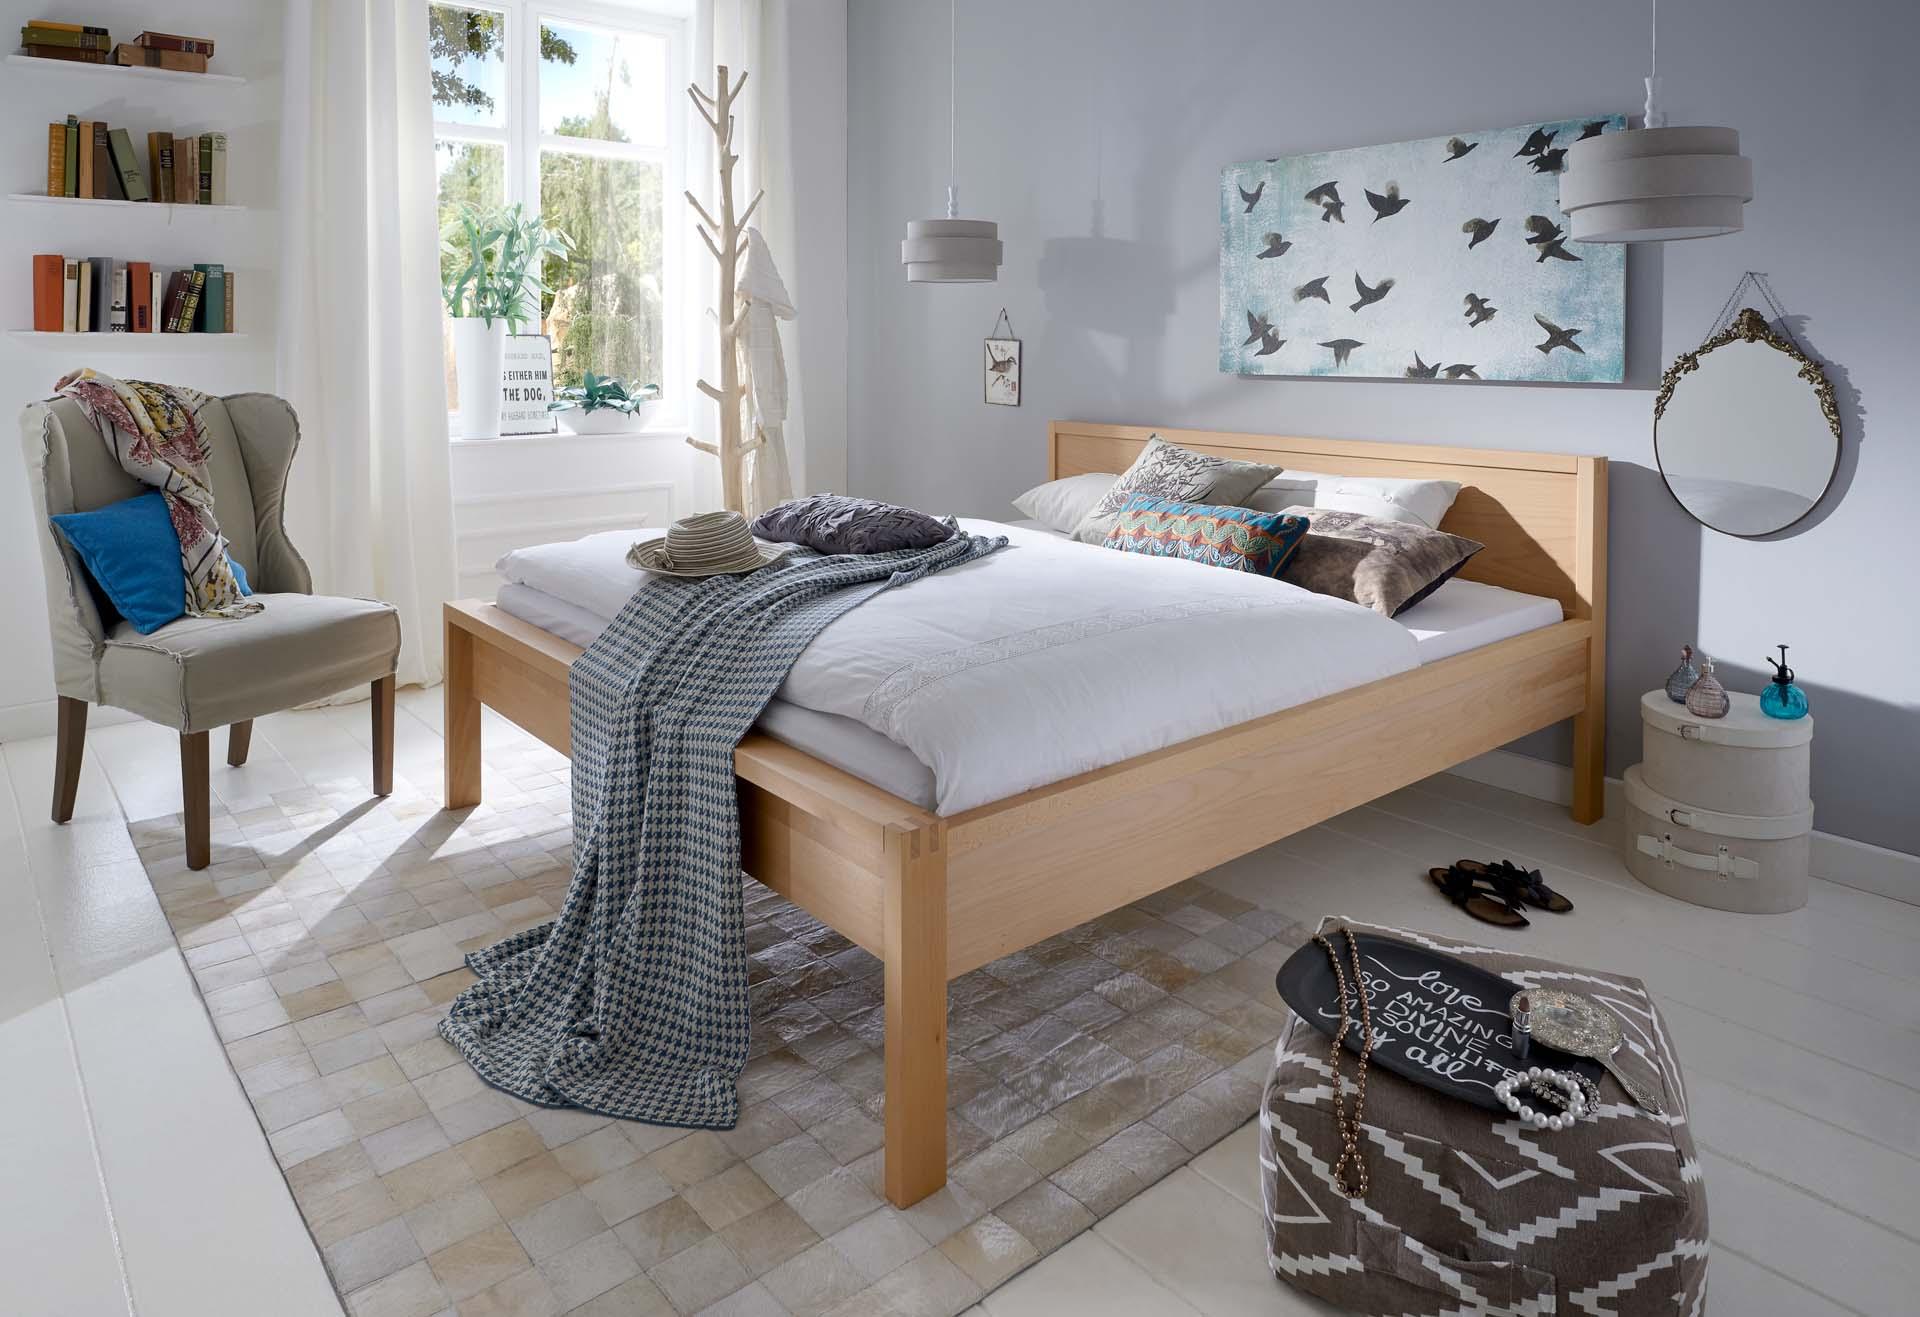 bettdecken strauss innovation sind alte bettdecken sperrm ll schlafzimmer komplett landhausstil. Black Bedroom Furniture Sets. Home Design Ideas